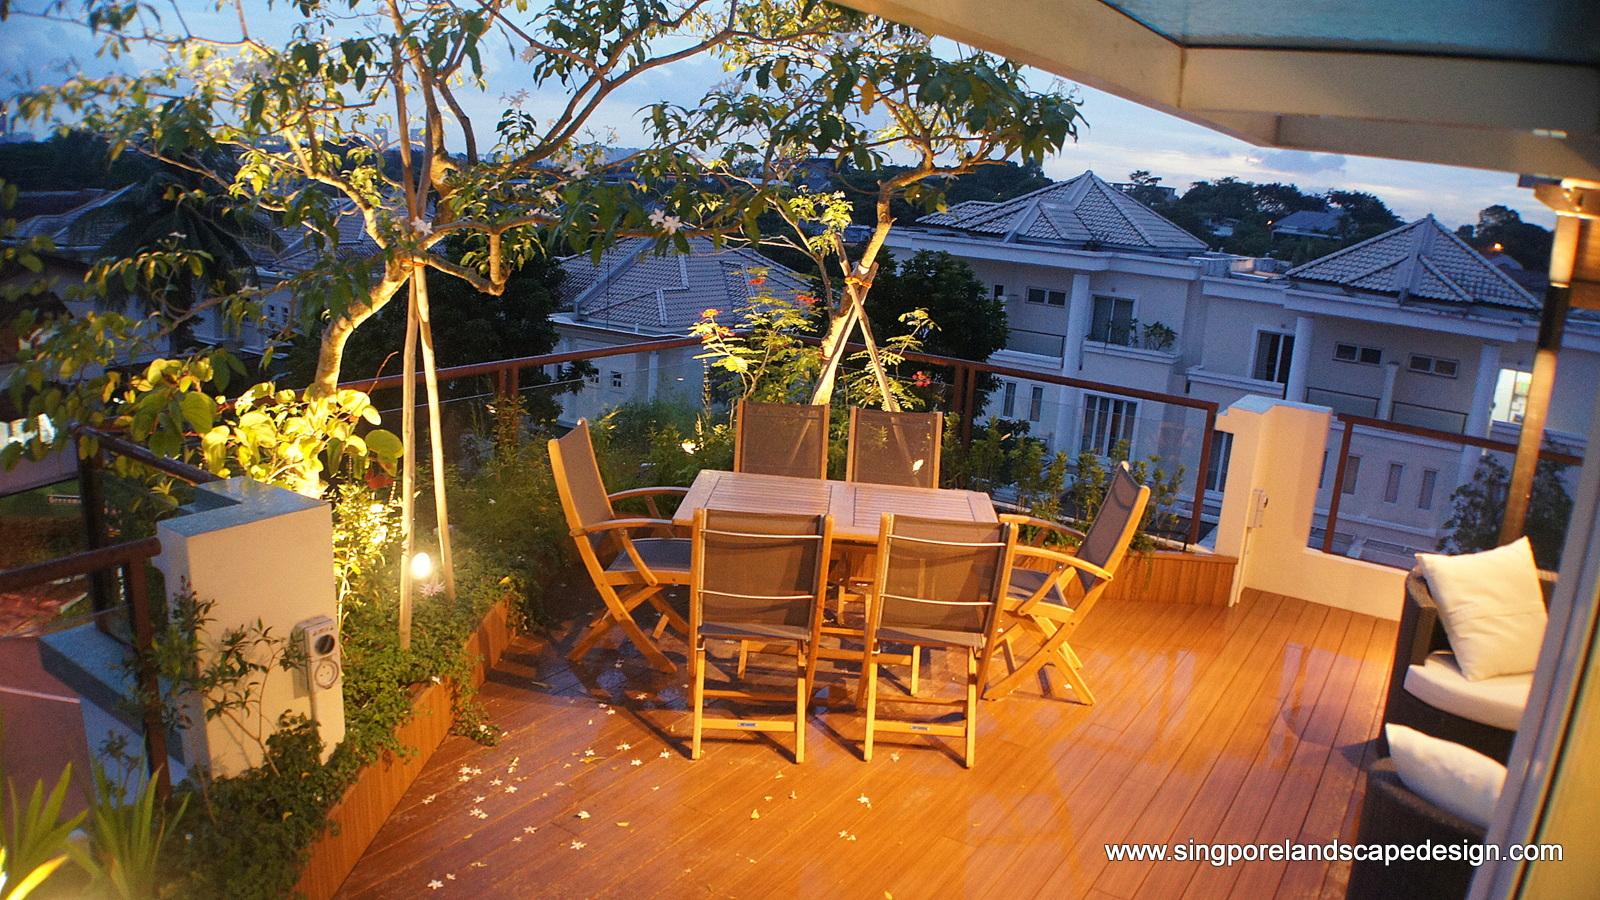 Singapore Landscape Design: Rooftop garden in-style1